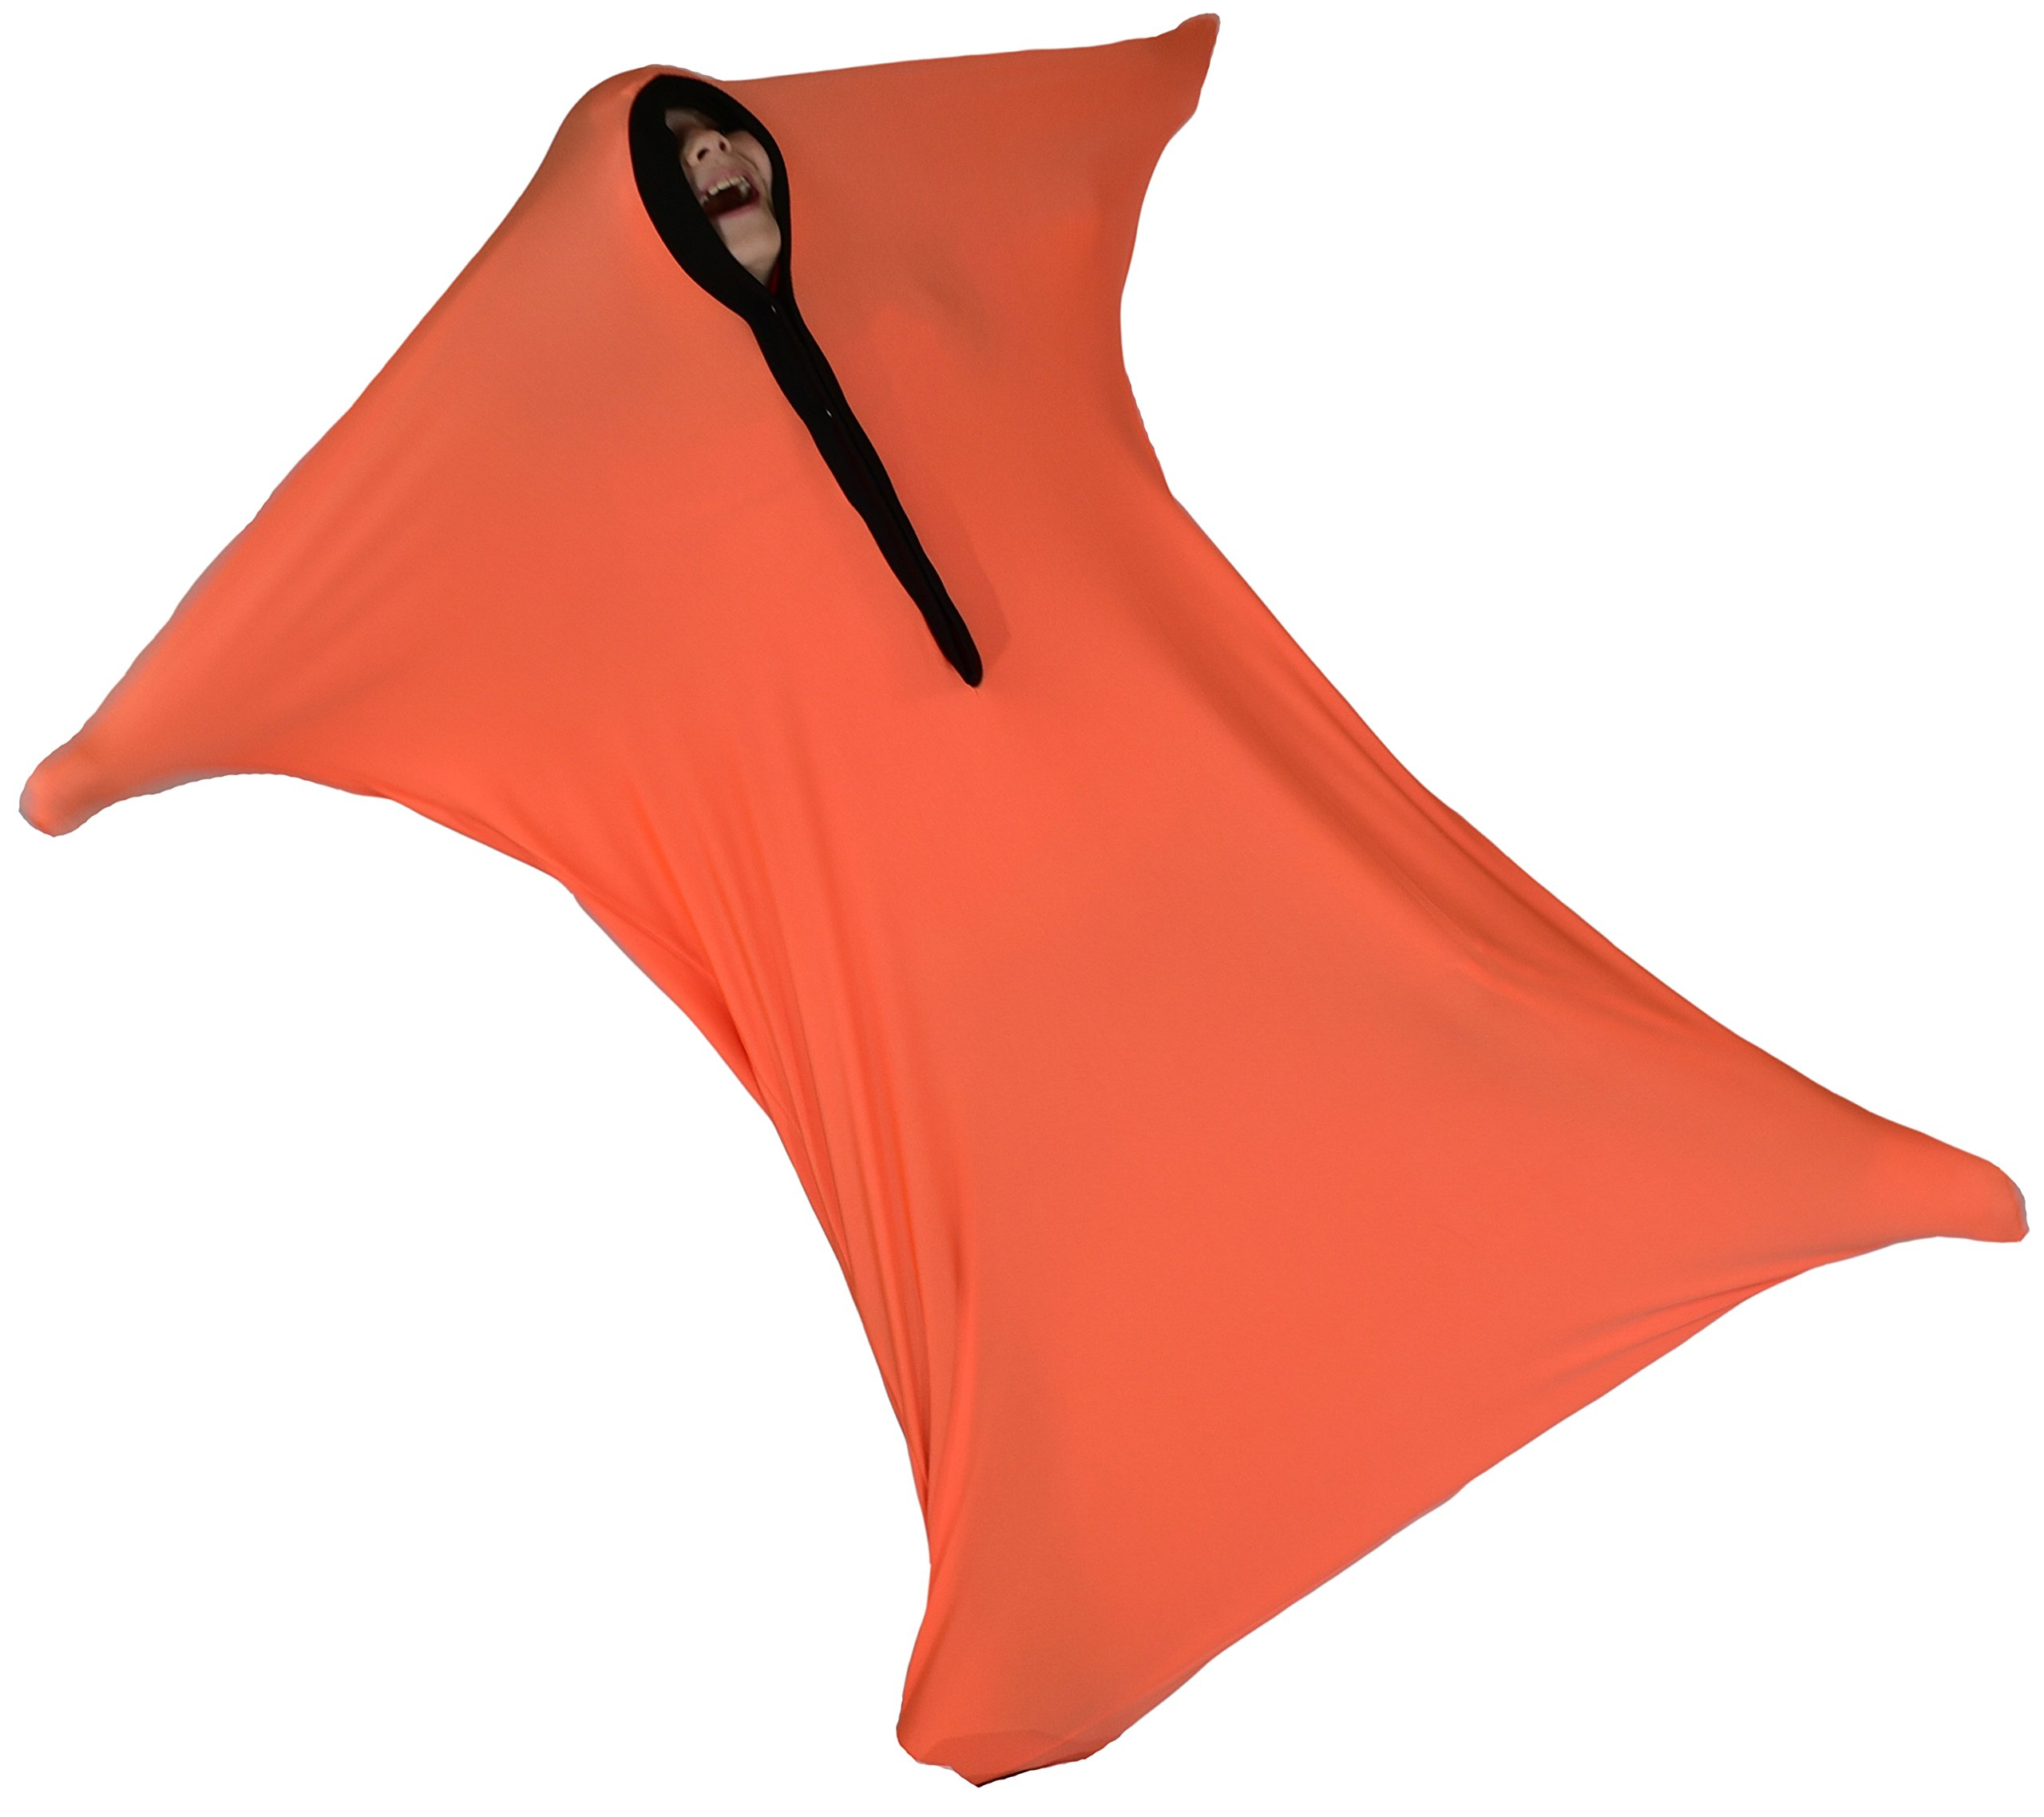 ZZZ Weighted Blankets Sensory Sack, Sensory Sock, Body Sock (Orange, Large (9-13)) by ZZZ Weighted Blankets